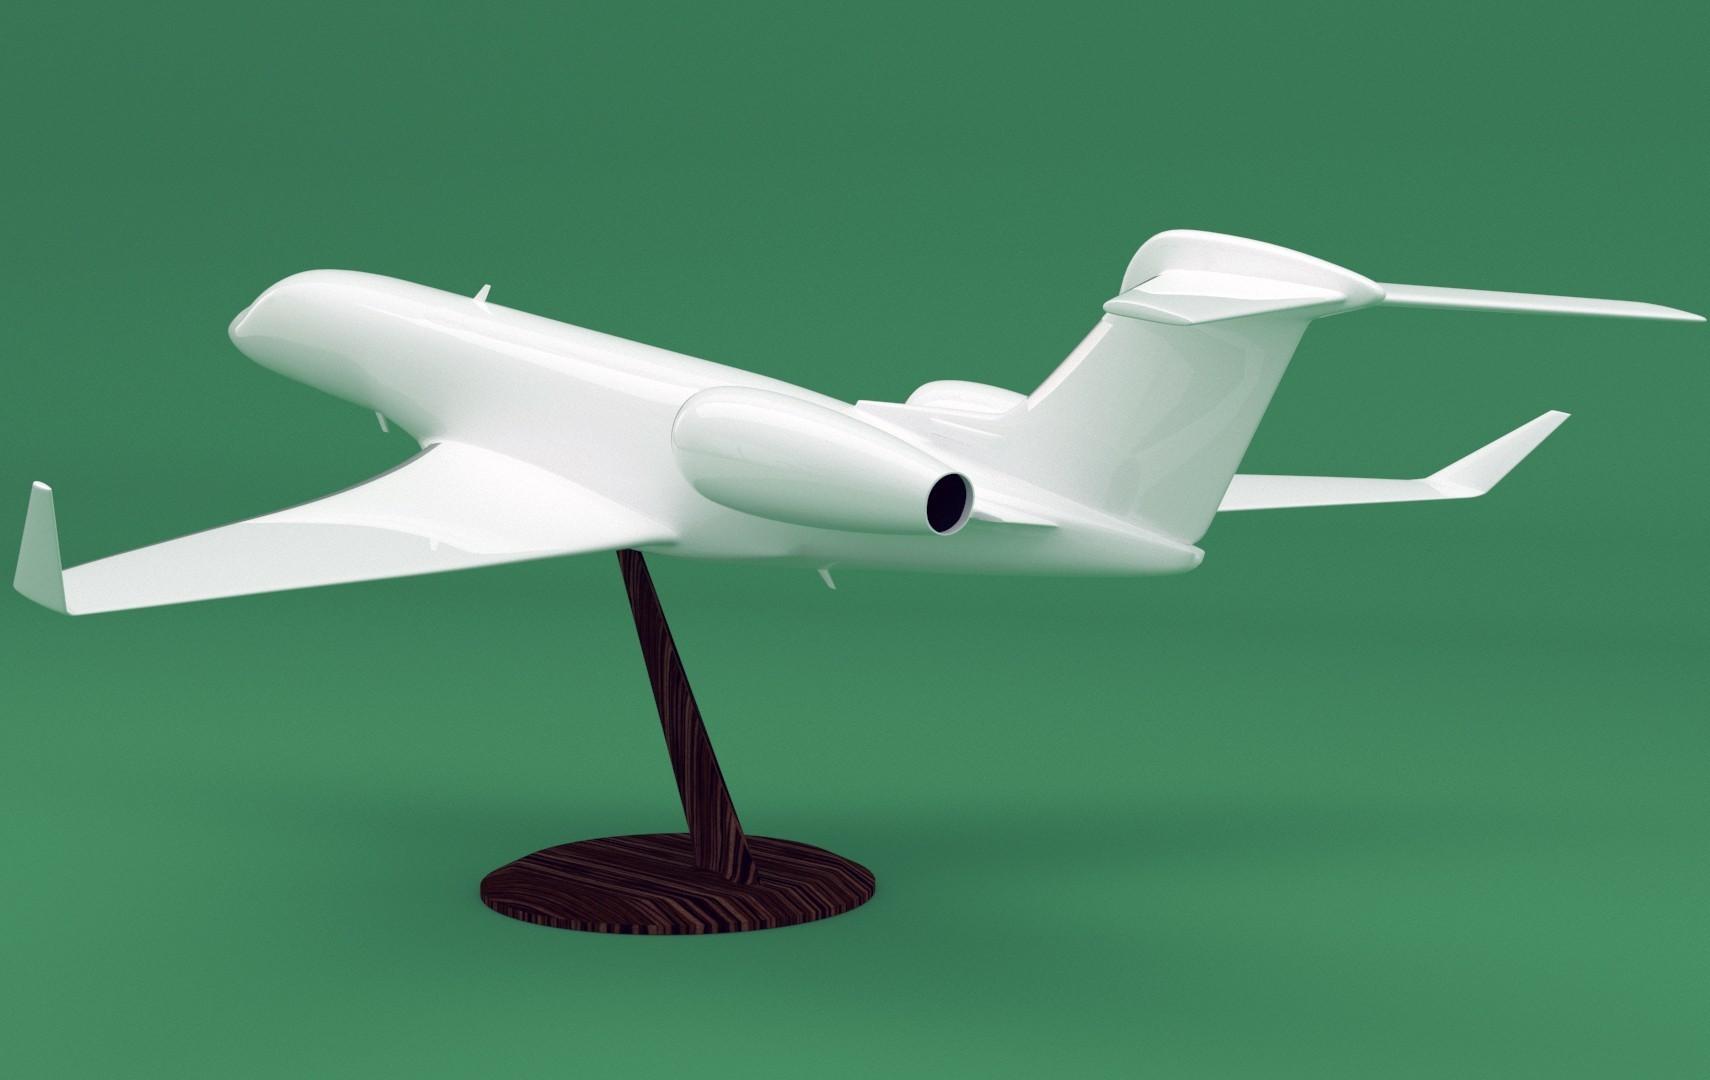 G650_3.jpg Download STL file Replica Gulfstream G650 3D print model • 3D print design, Eduardohbm